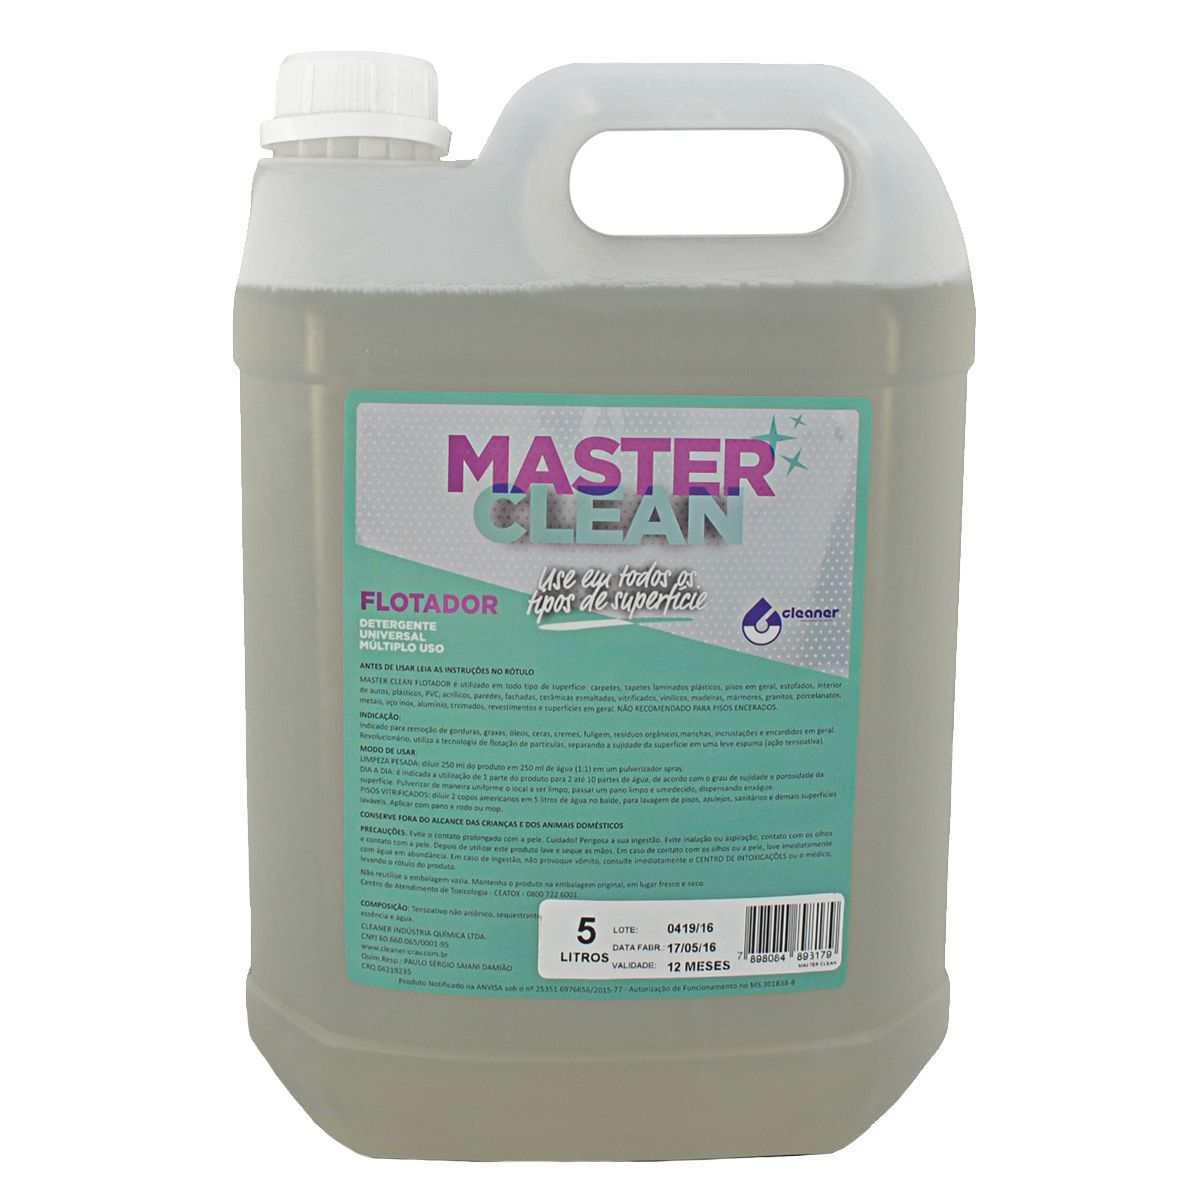 Apc Multiuso Master Clean Flotador Cleaner 5L